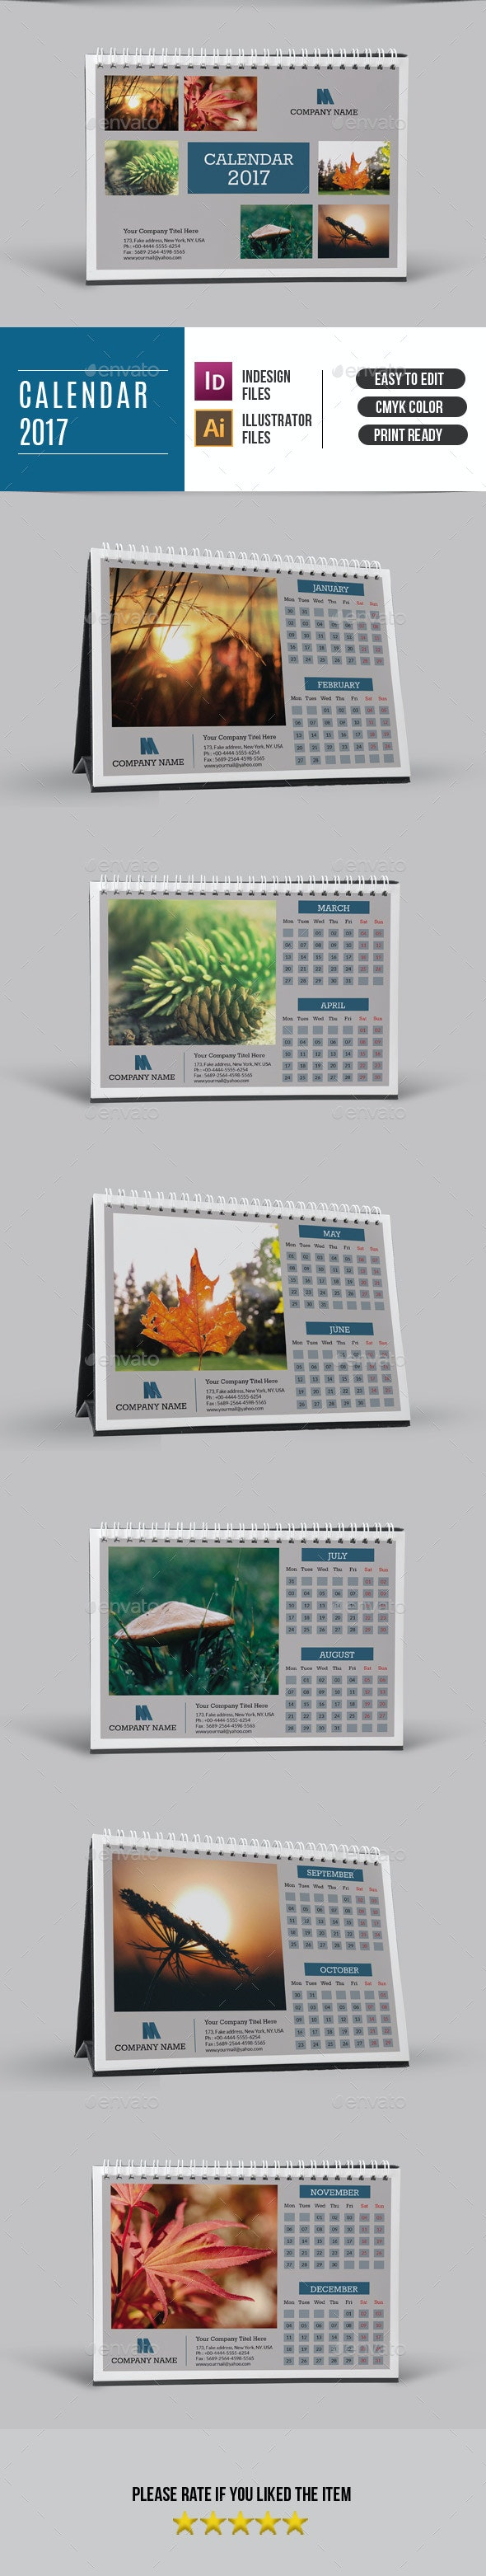 Desk Calendar Template for 2017 | Updated - Calendars Stationery